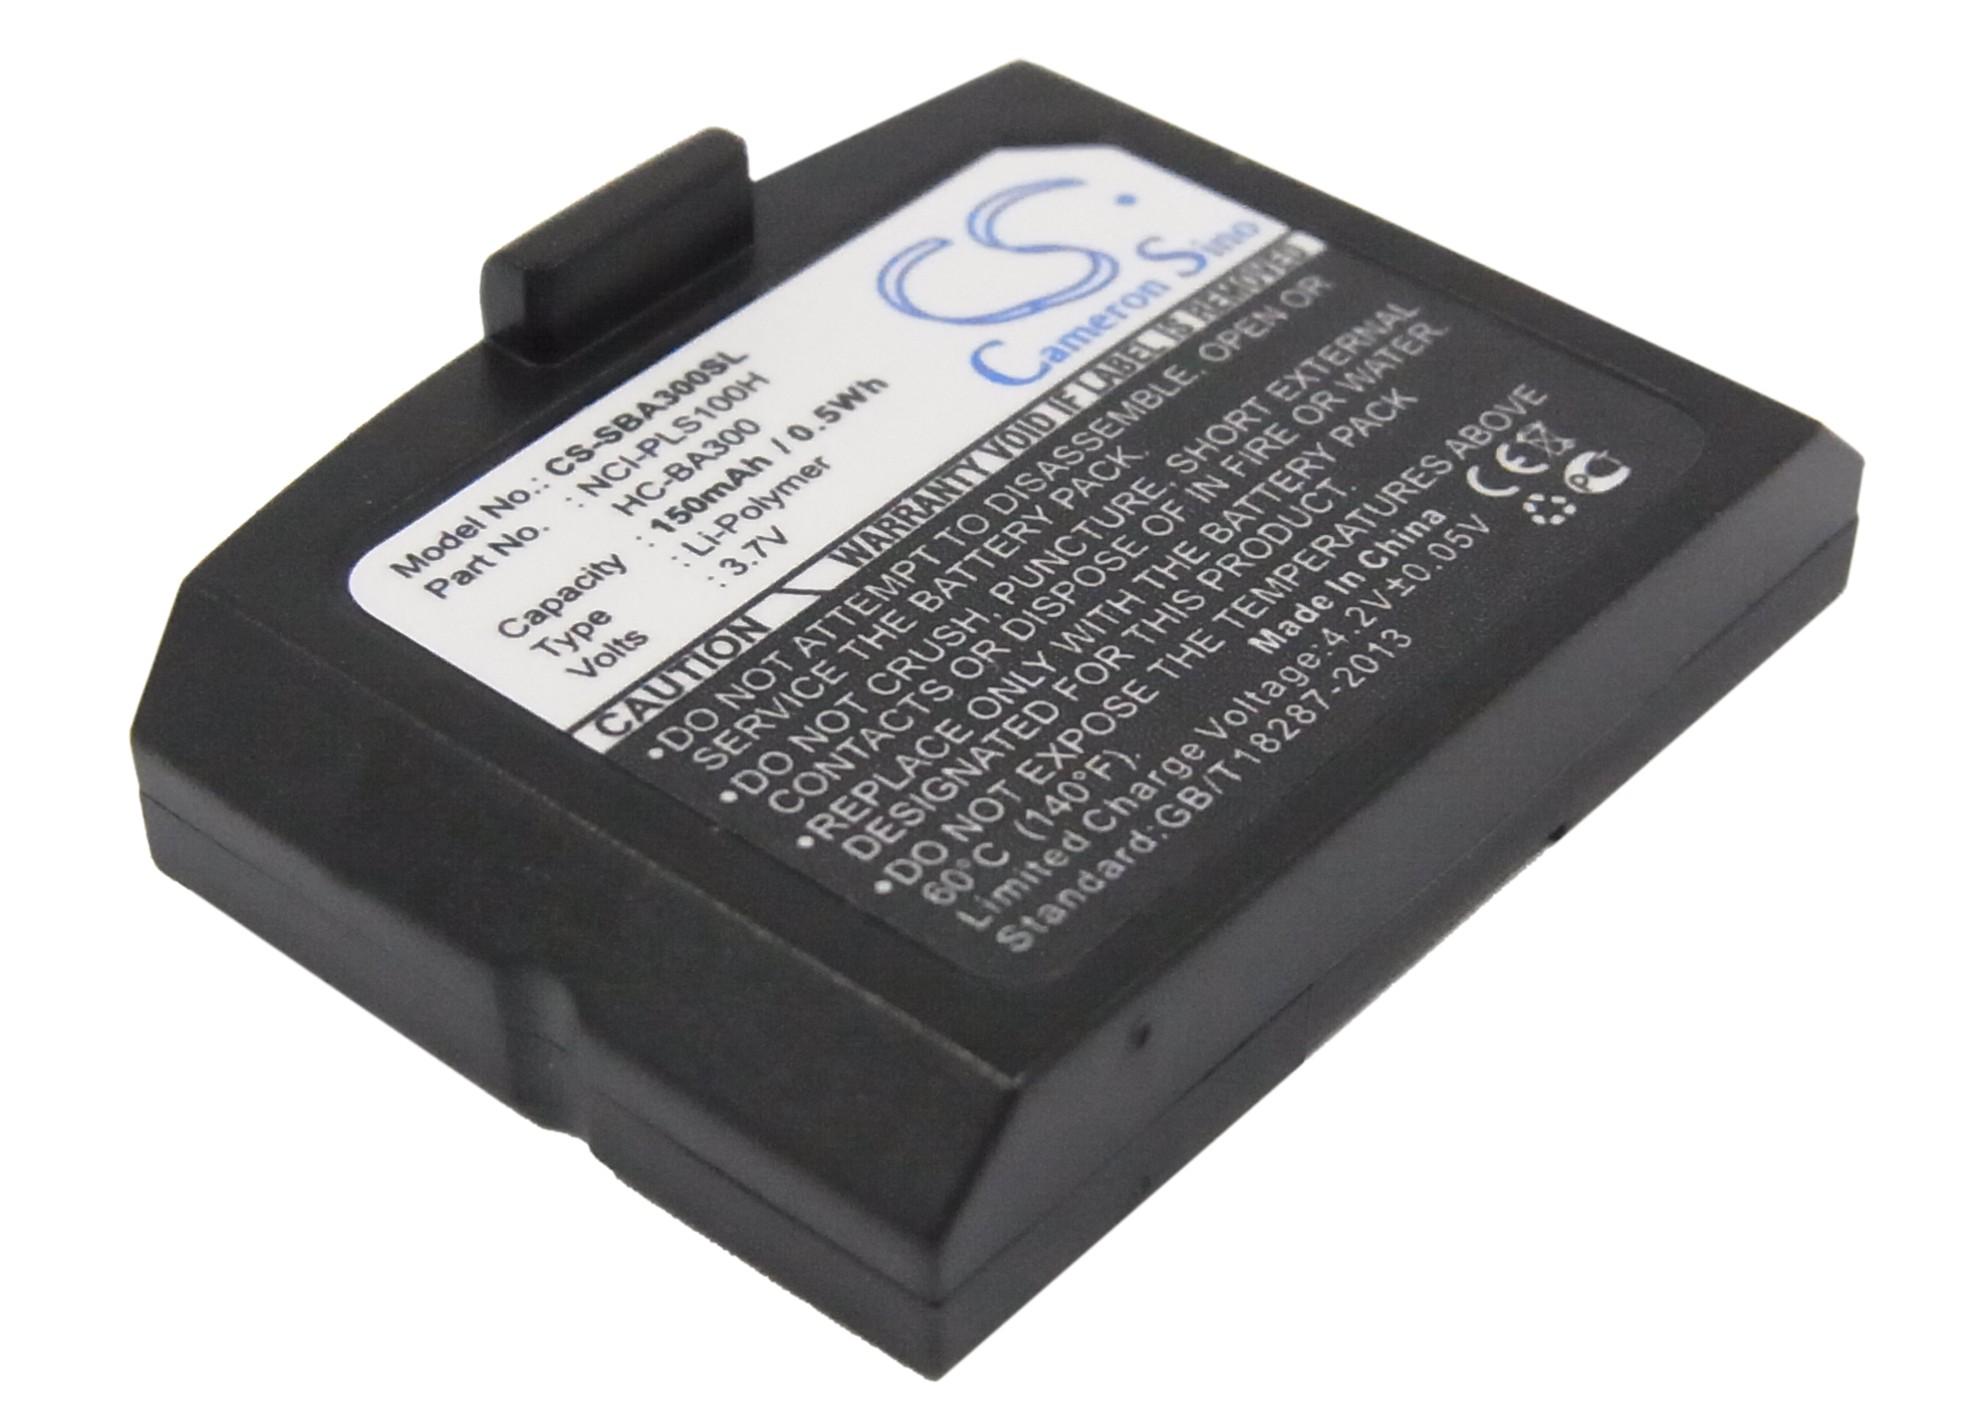 Cameron Sino baterie do bezdrátových sluchátek a headsetů pro SENNHEISER RS 4200 3.7V Li-Polymer 150mAh černá - neoriginální